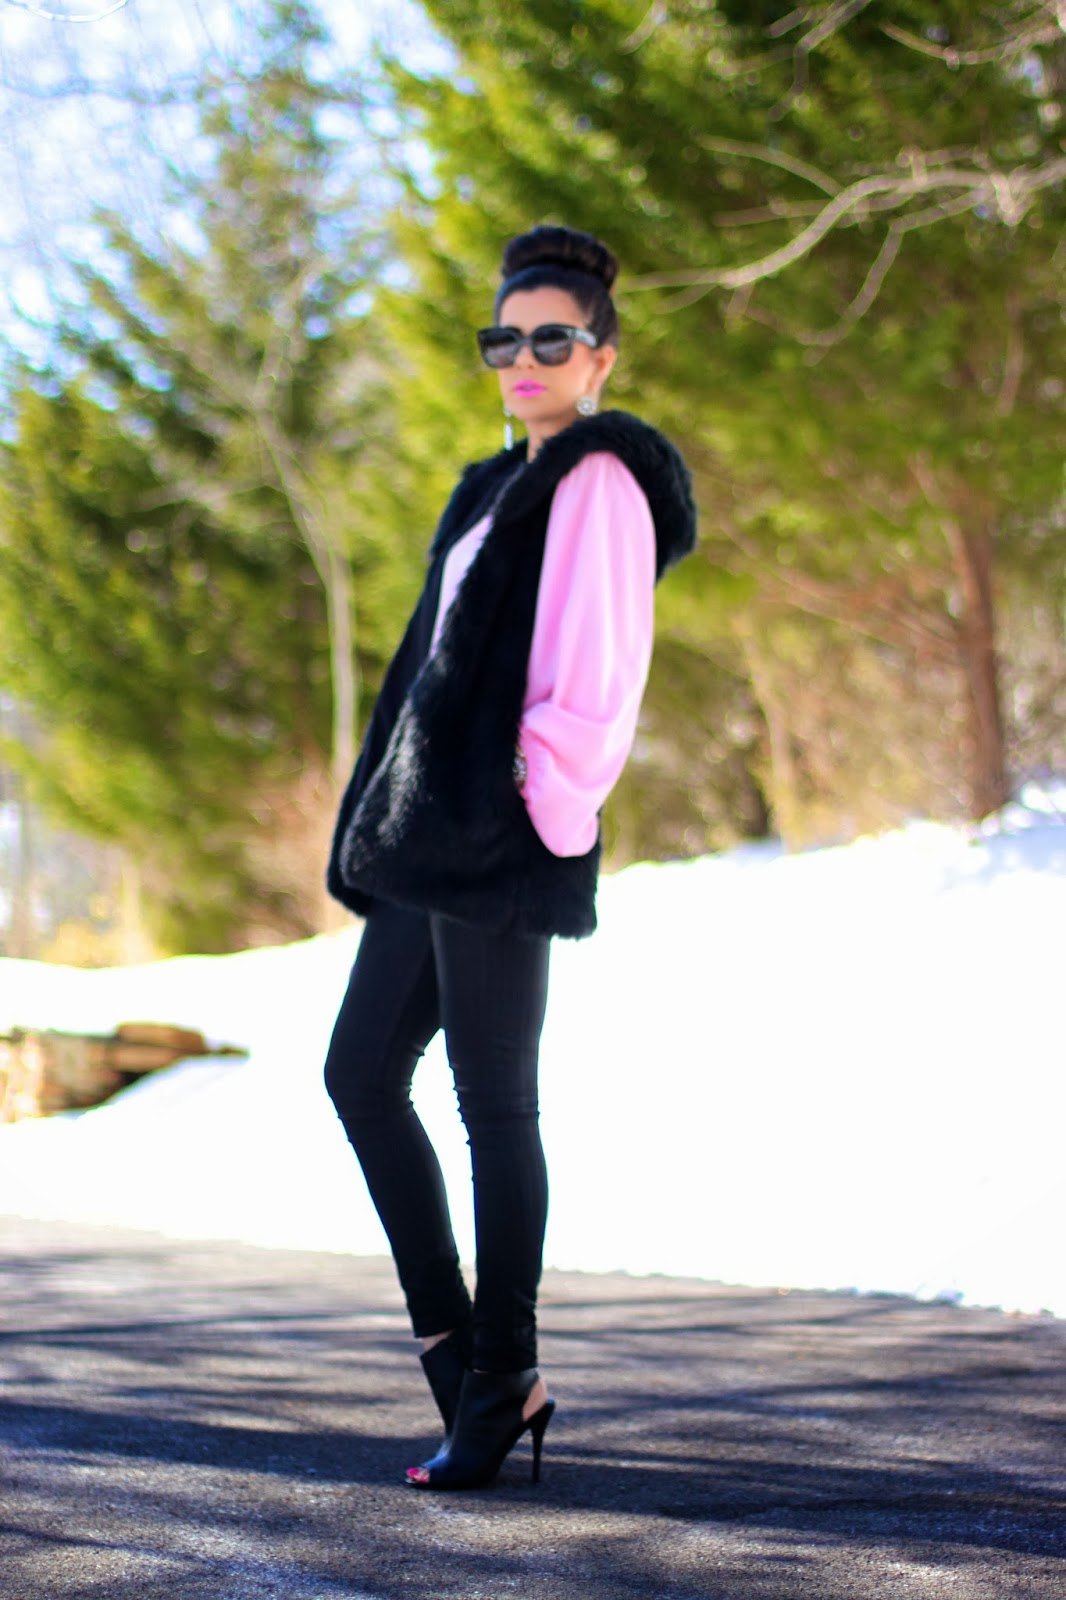 celine sunglasses, celine new audrey, faux fur vest, faux fur black vest, pink shirt, shop sosie, top knot, pink links, statement earrings, black quilted leather bag, siramara bracelet